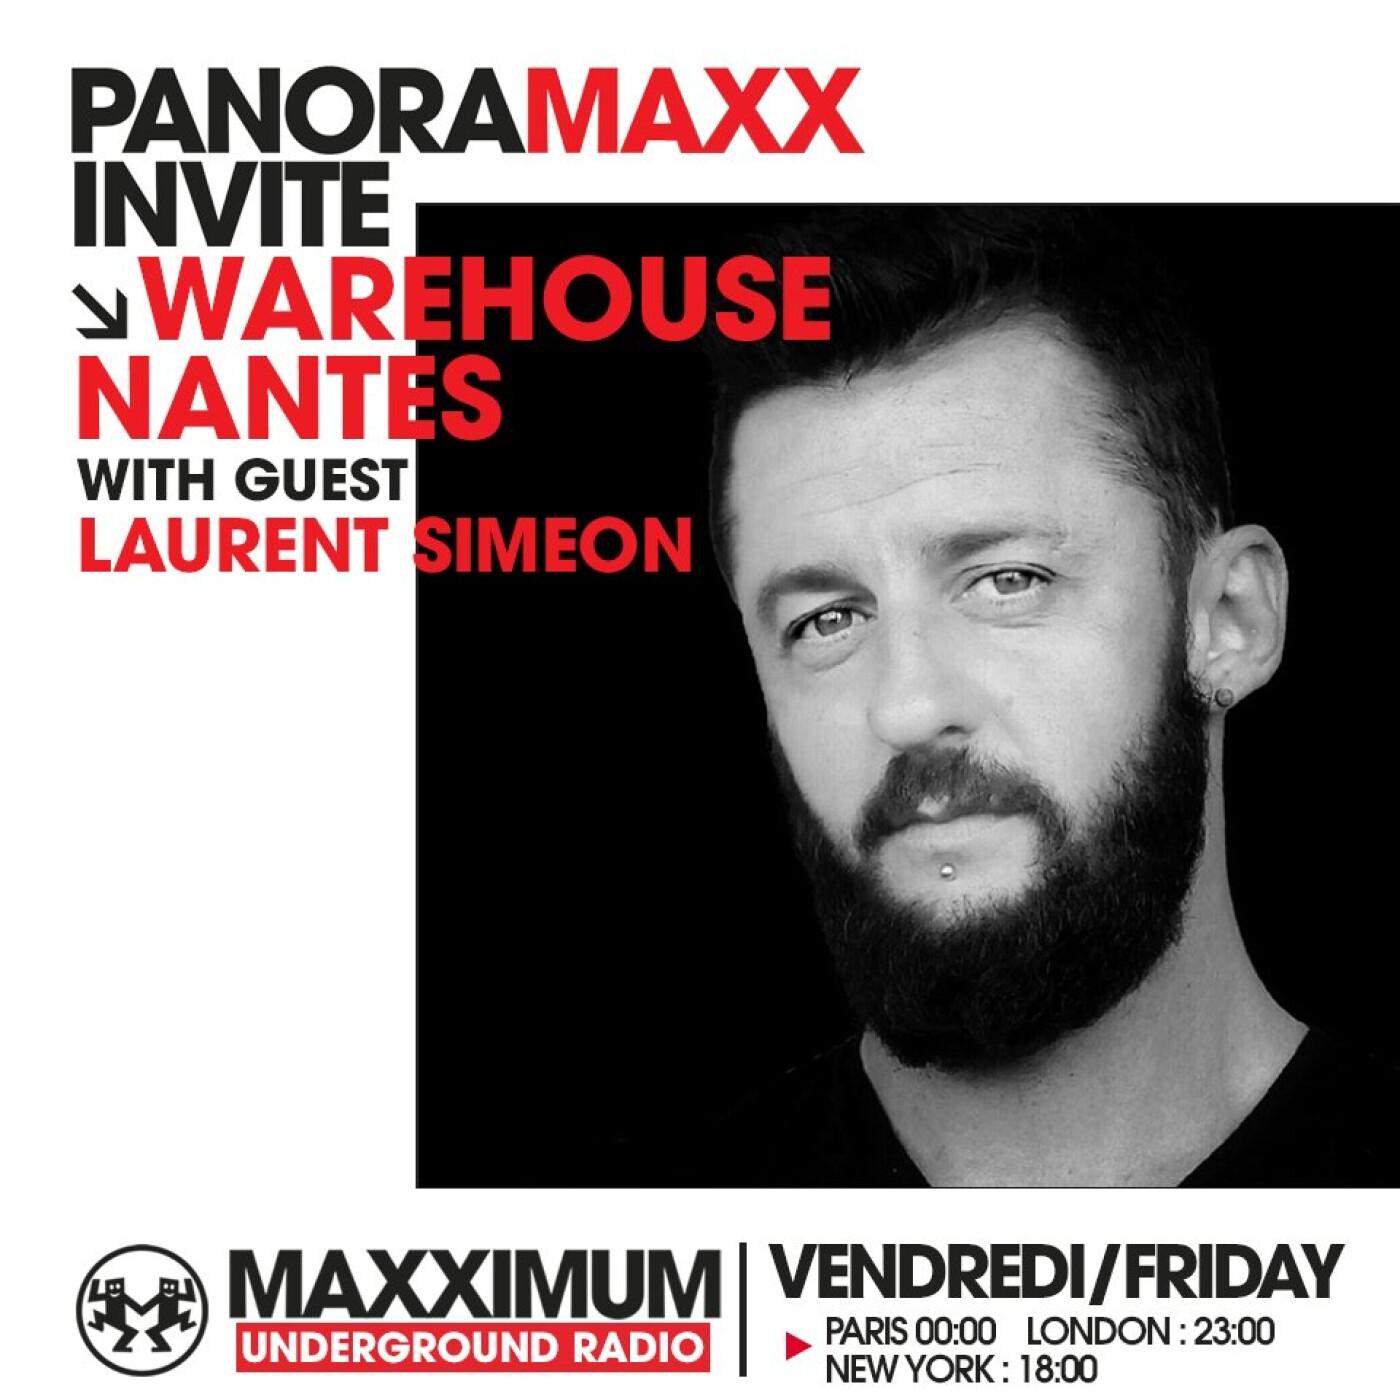 PANORAMAXX : LAURENT SIMEON DU WAREHOUSE DE NANTES